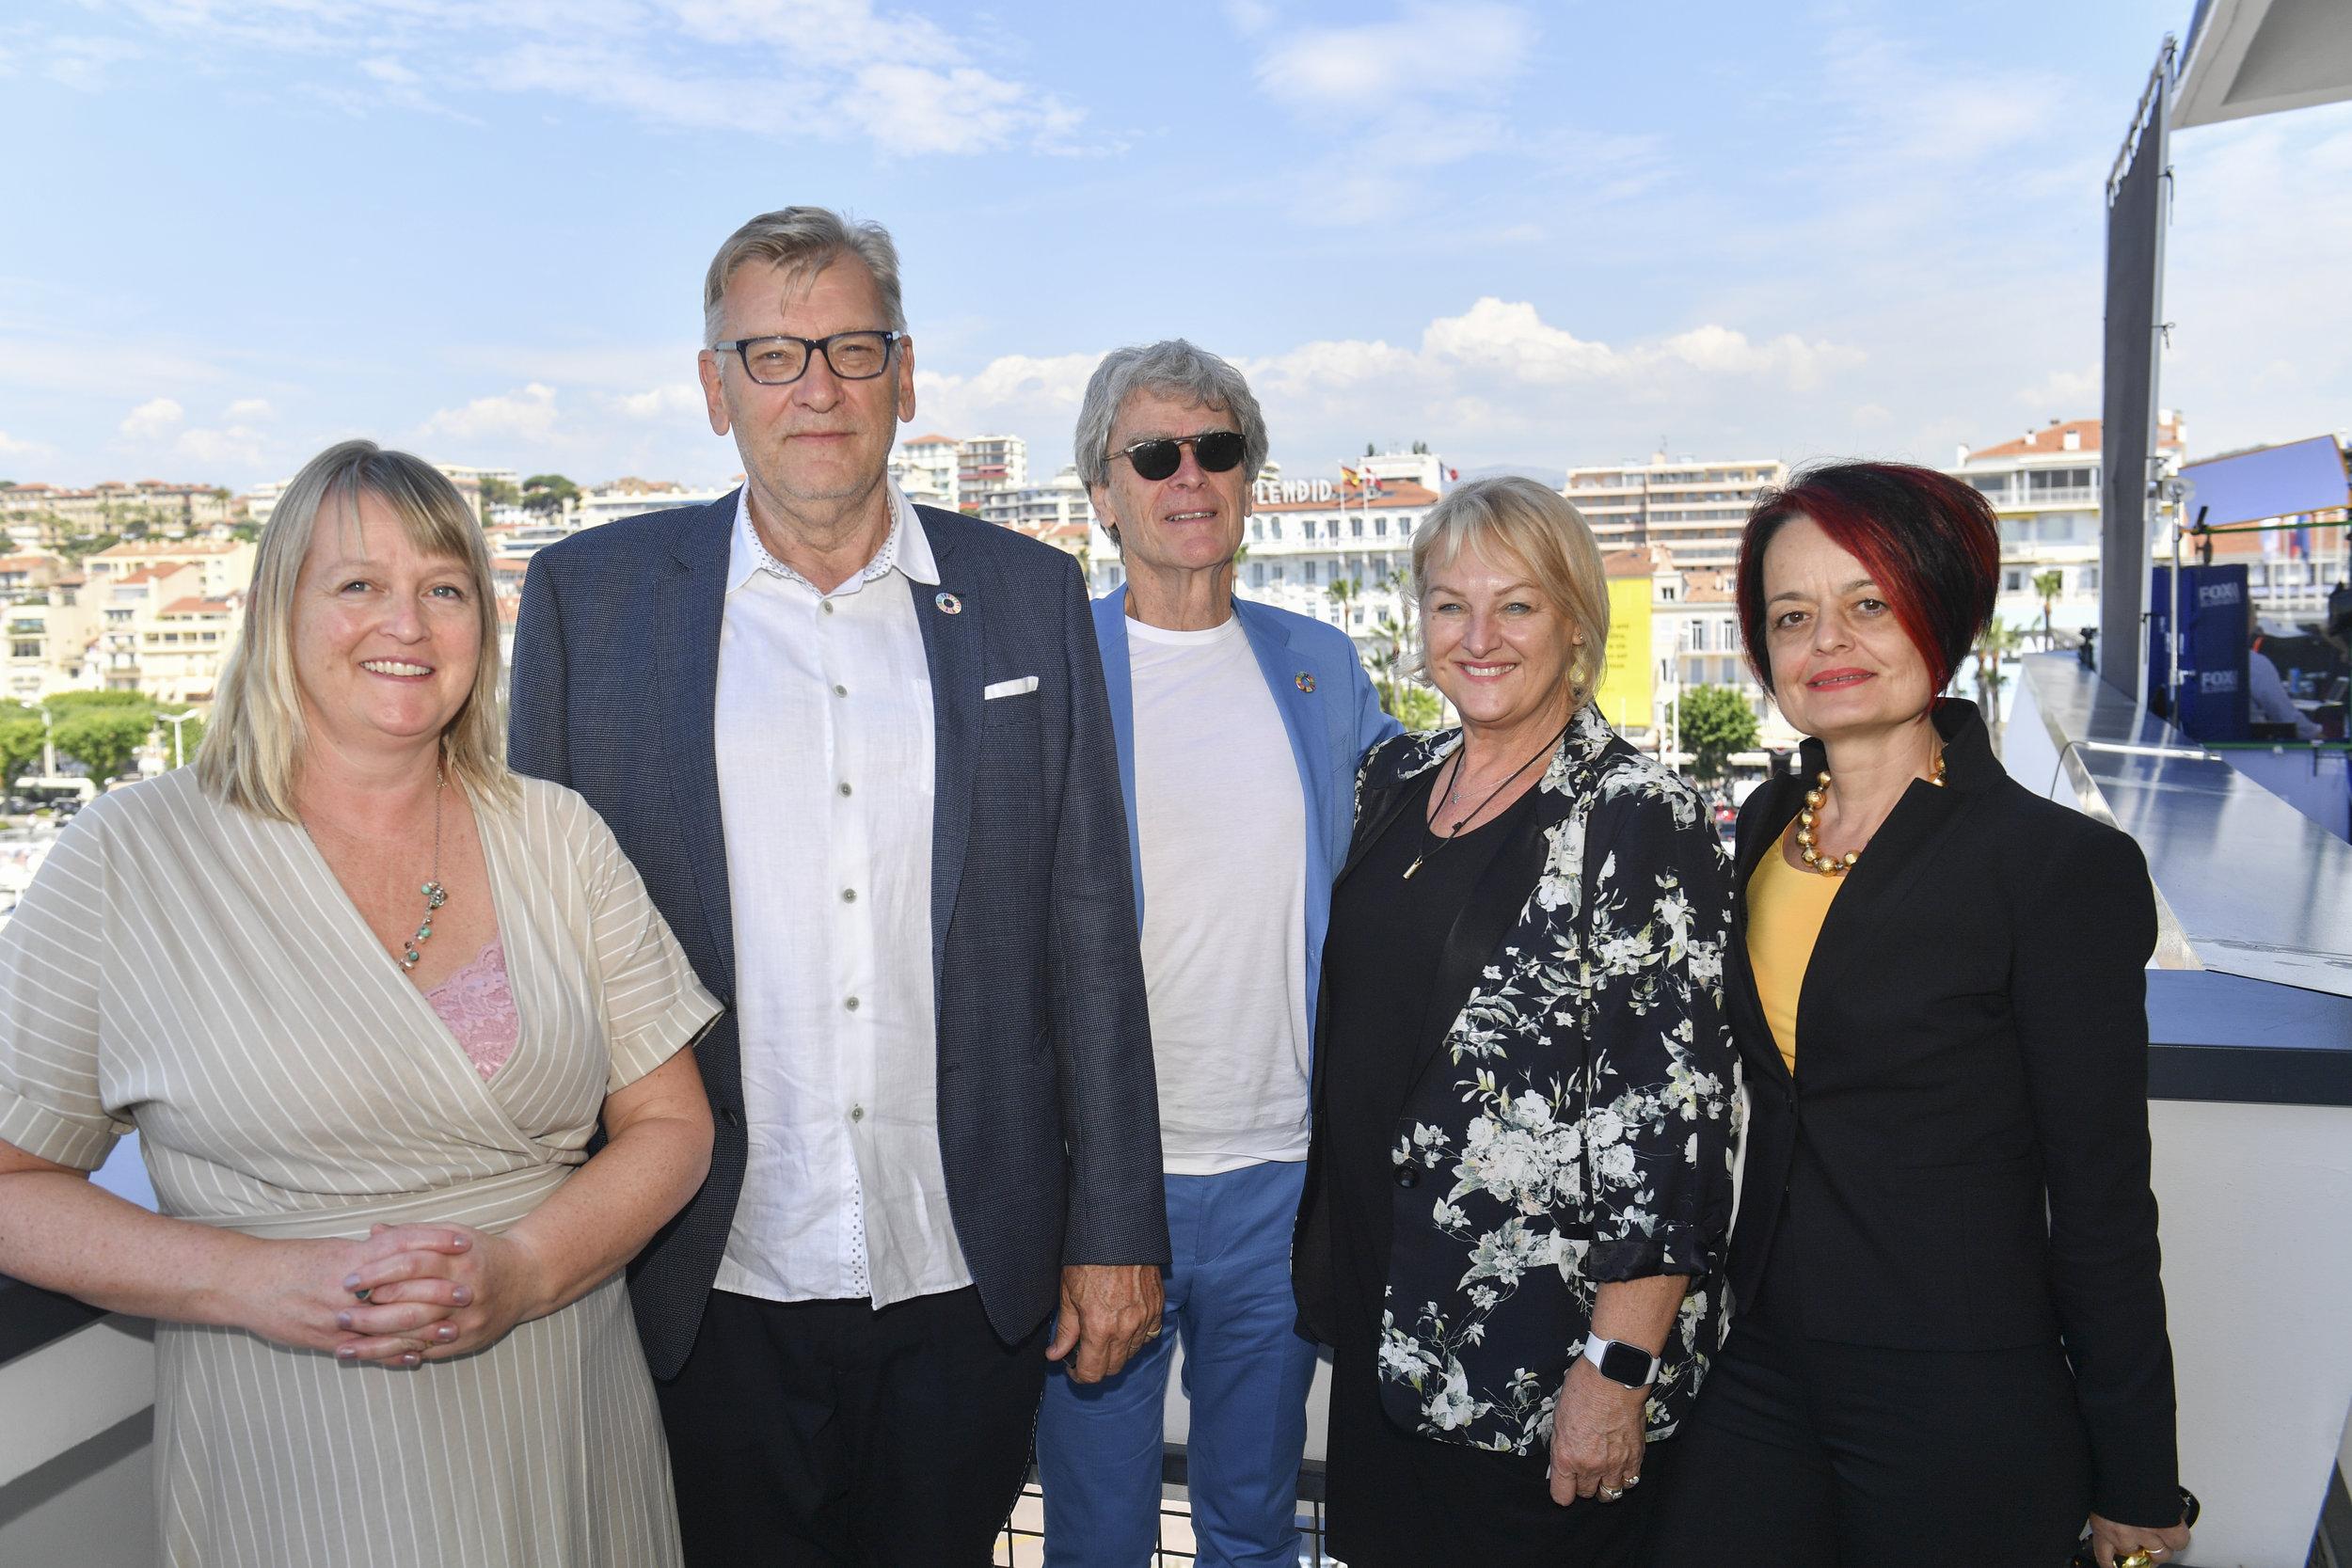 Corinne Woods (left), Terry Savage, Sir John Hegarty, Cheryl Wannell and WFP's Corinne Fleischer